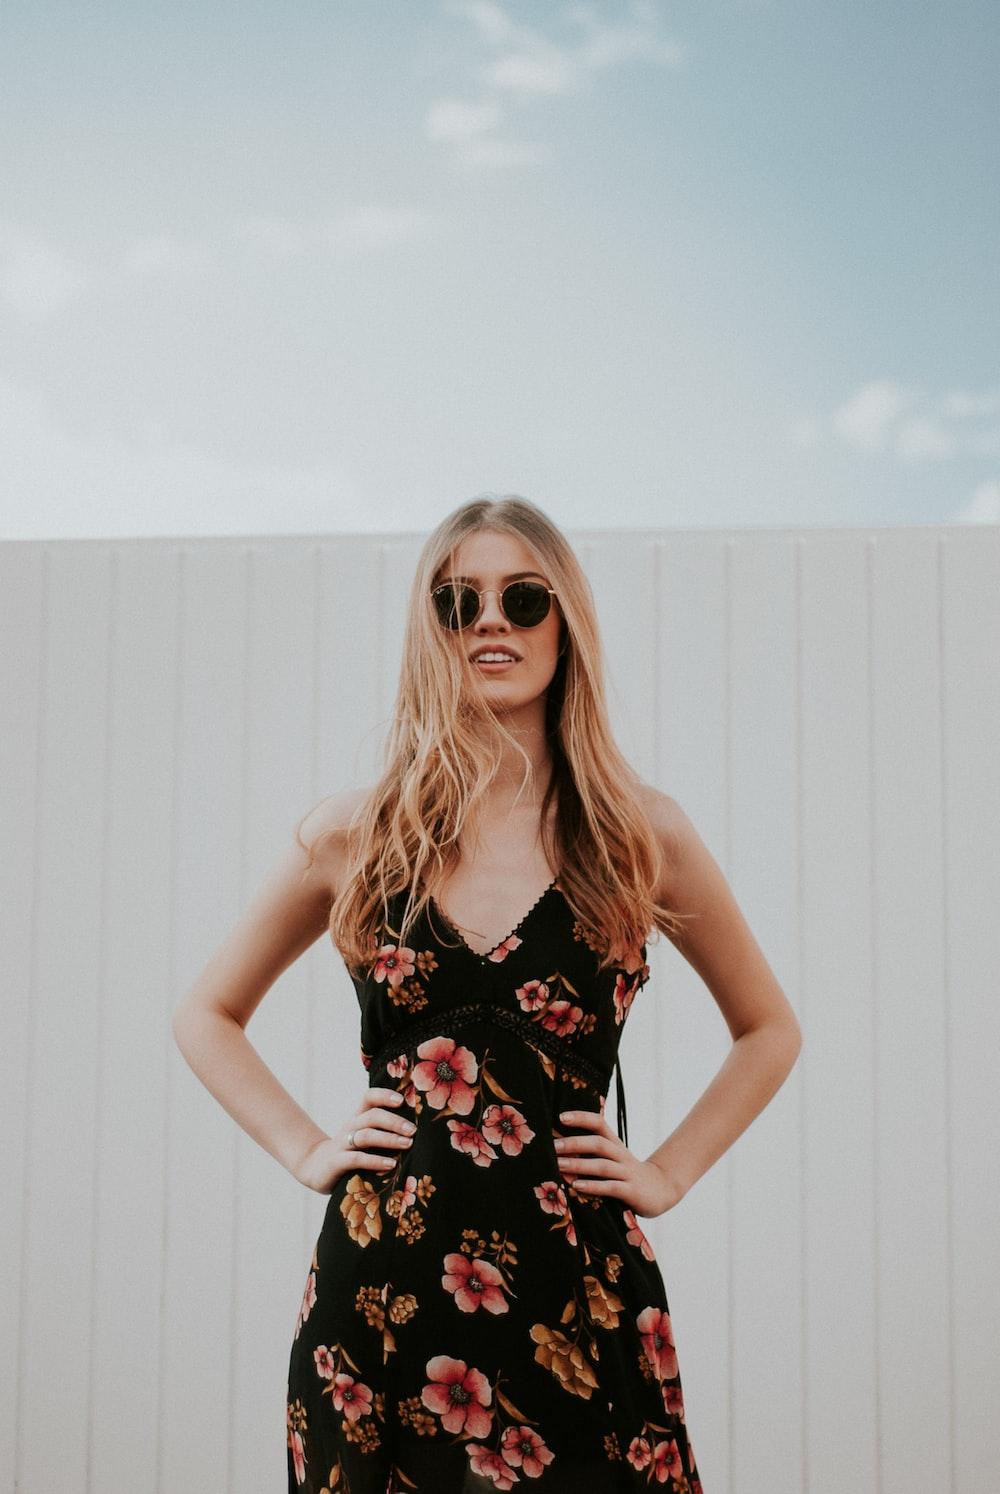 woman wearing black sunglasses standing near white wooden wall